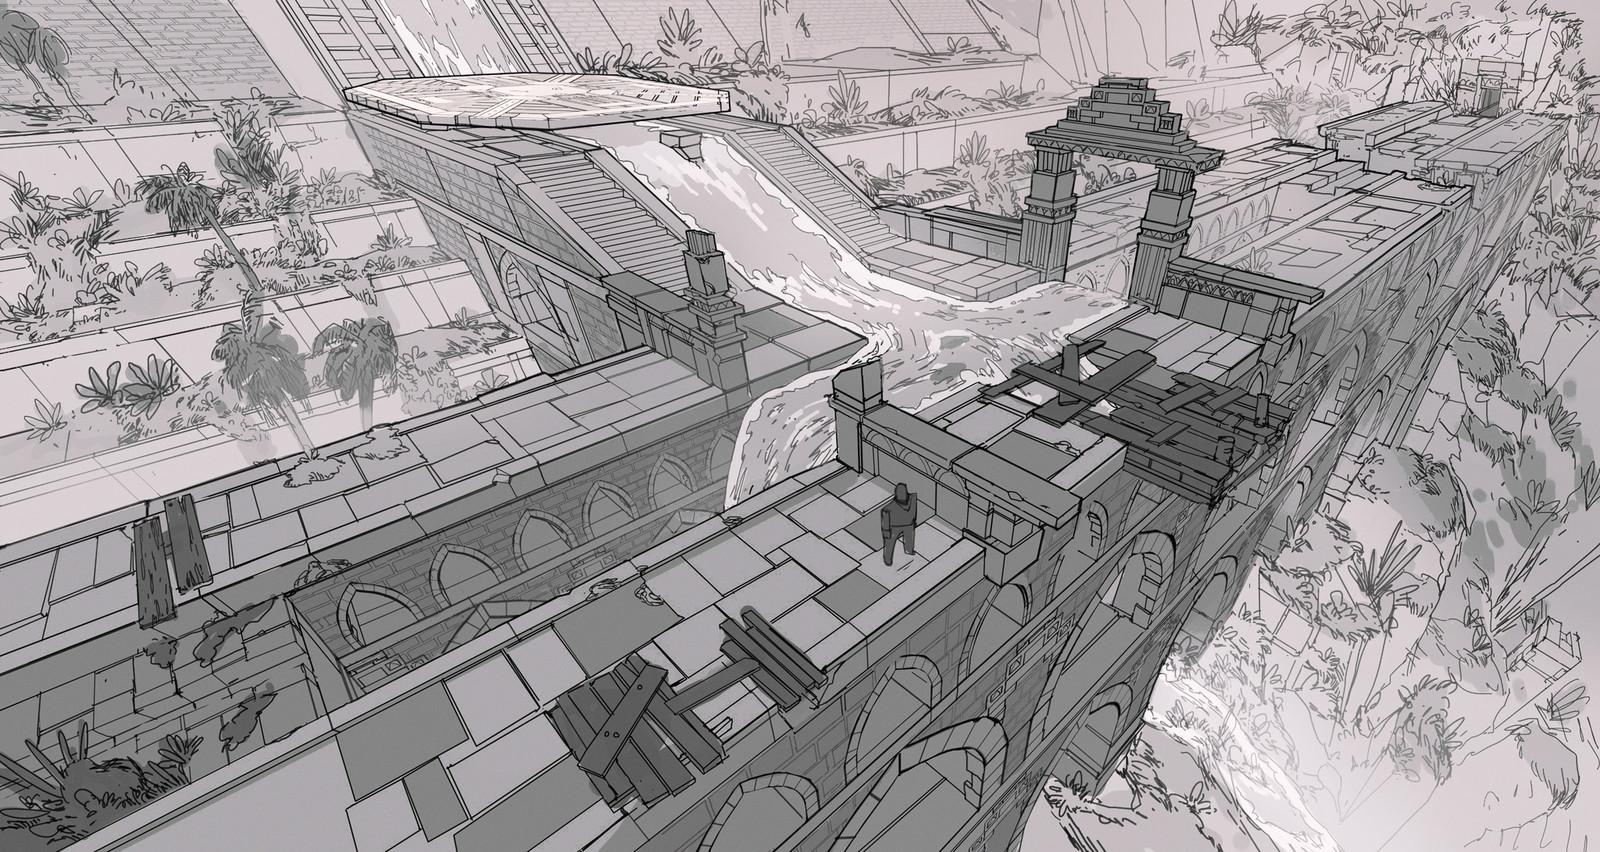 Bridge and Jungle Ruins Concepts - Adventure RPG Game